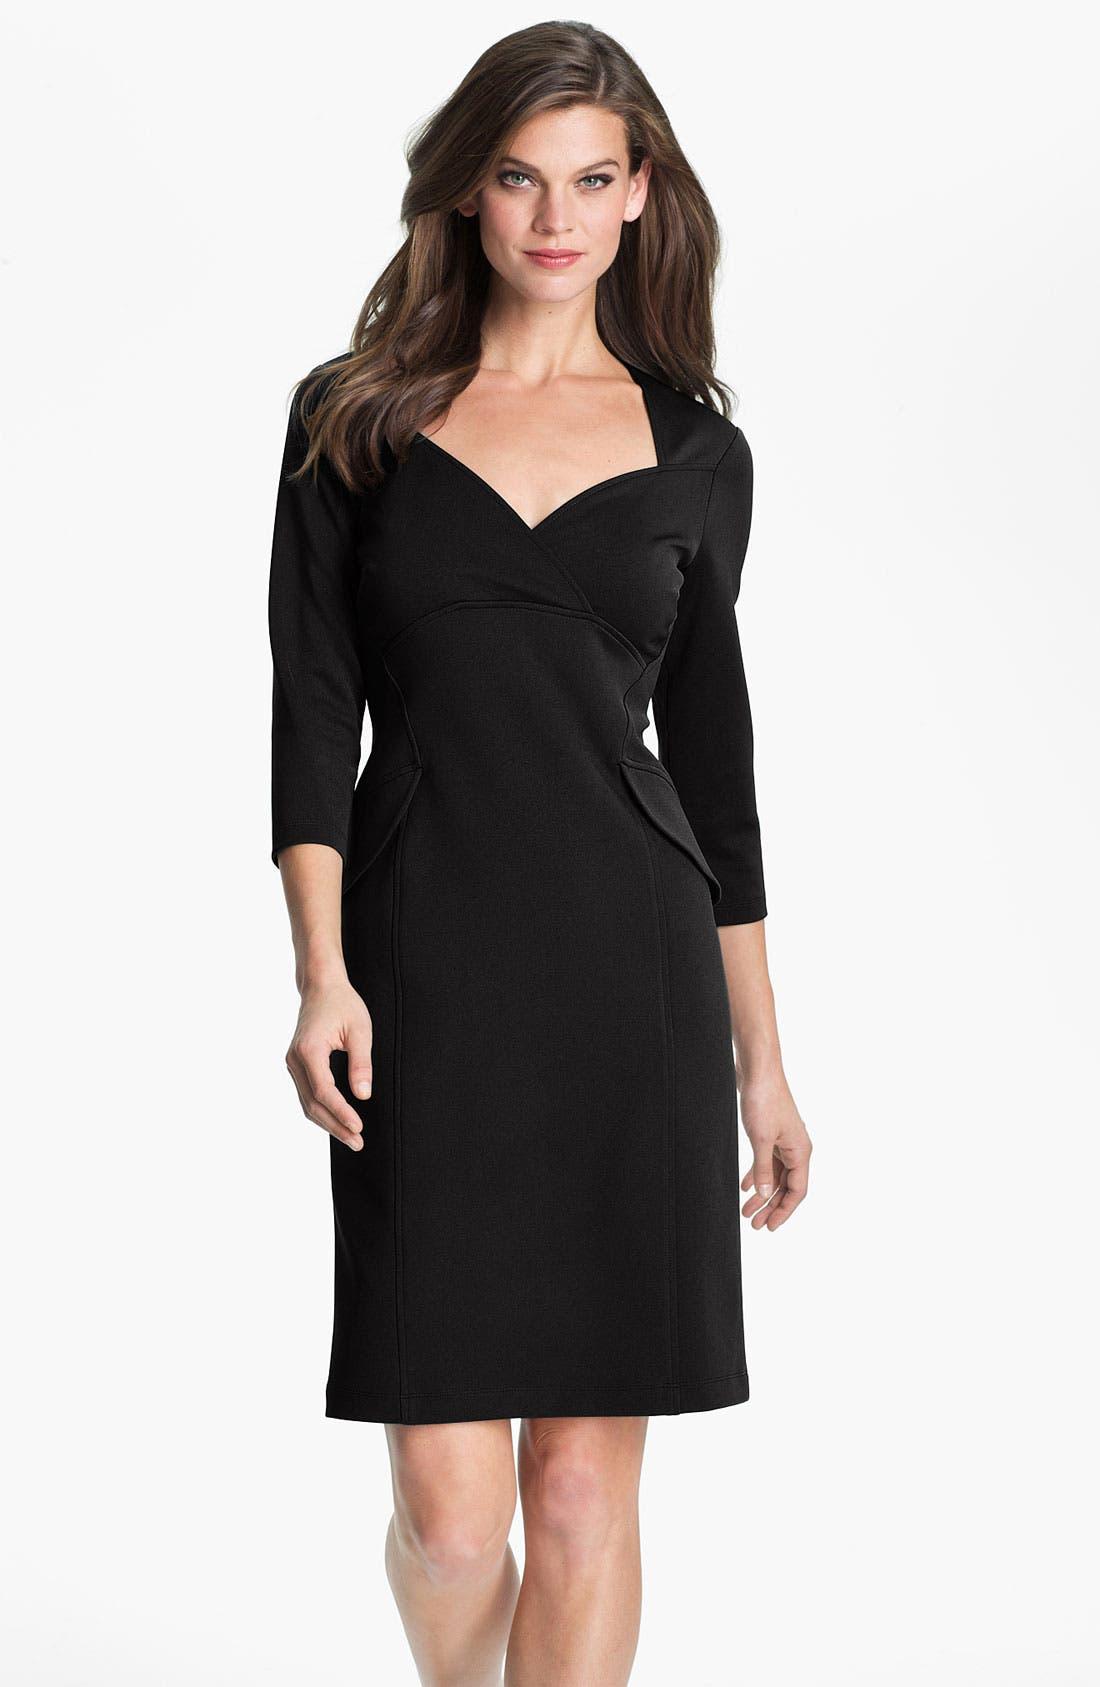 Alternate Image 1 Selected - Maggy London Side Peplum Sheath Dress